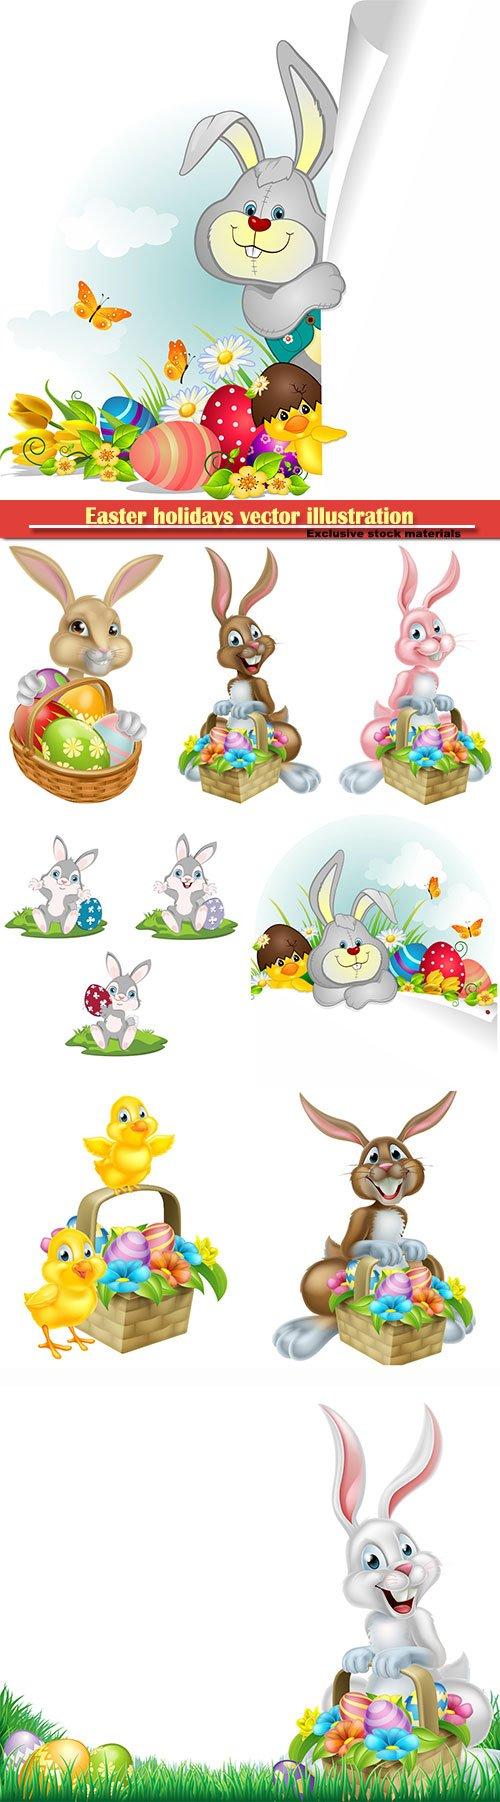 Easter holidays vector illustration # 7